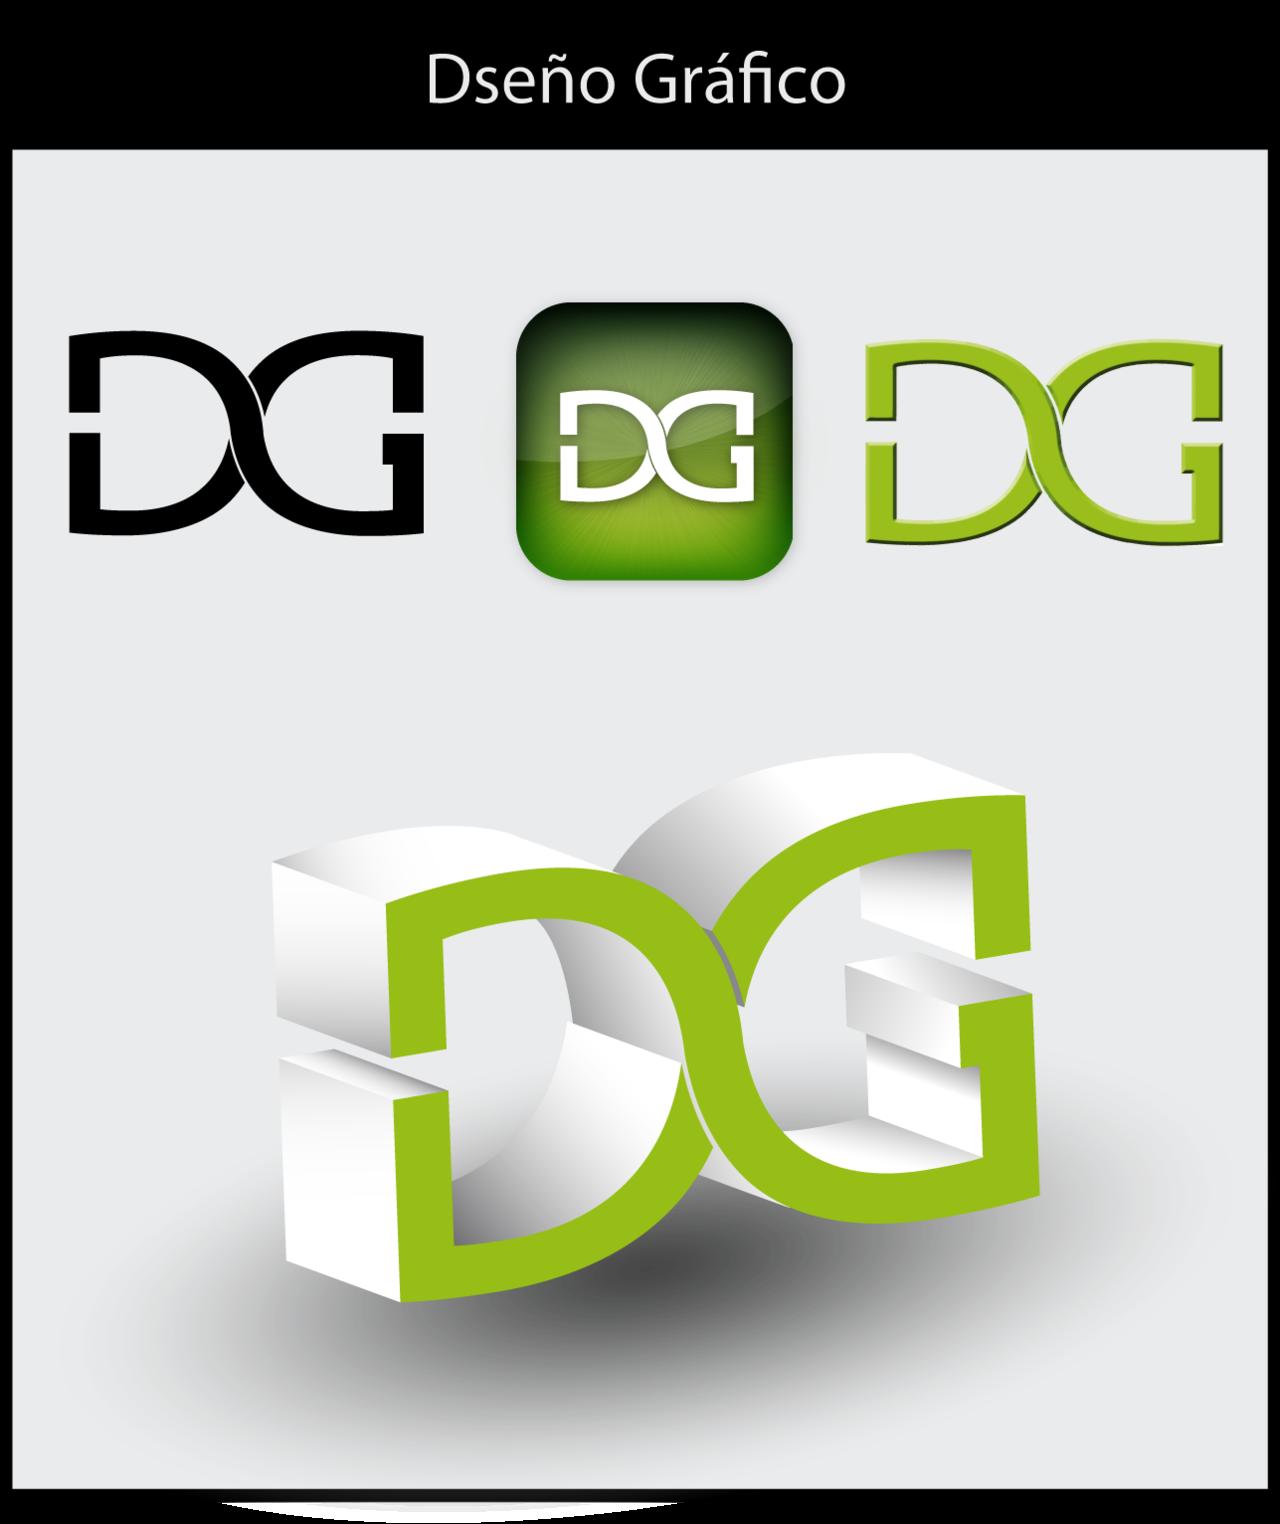 very popular logo dg logo Theory Clothing Logo Brand of Apparel Logo